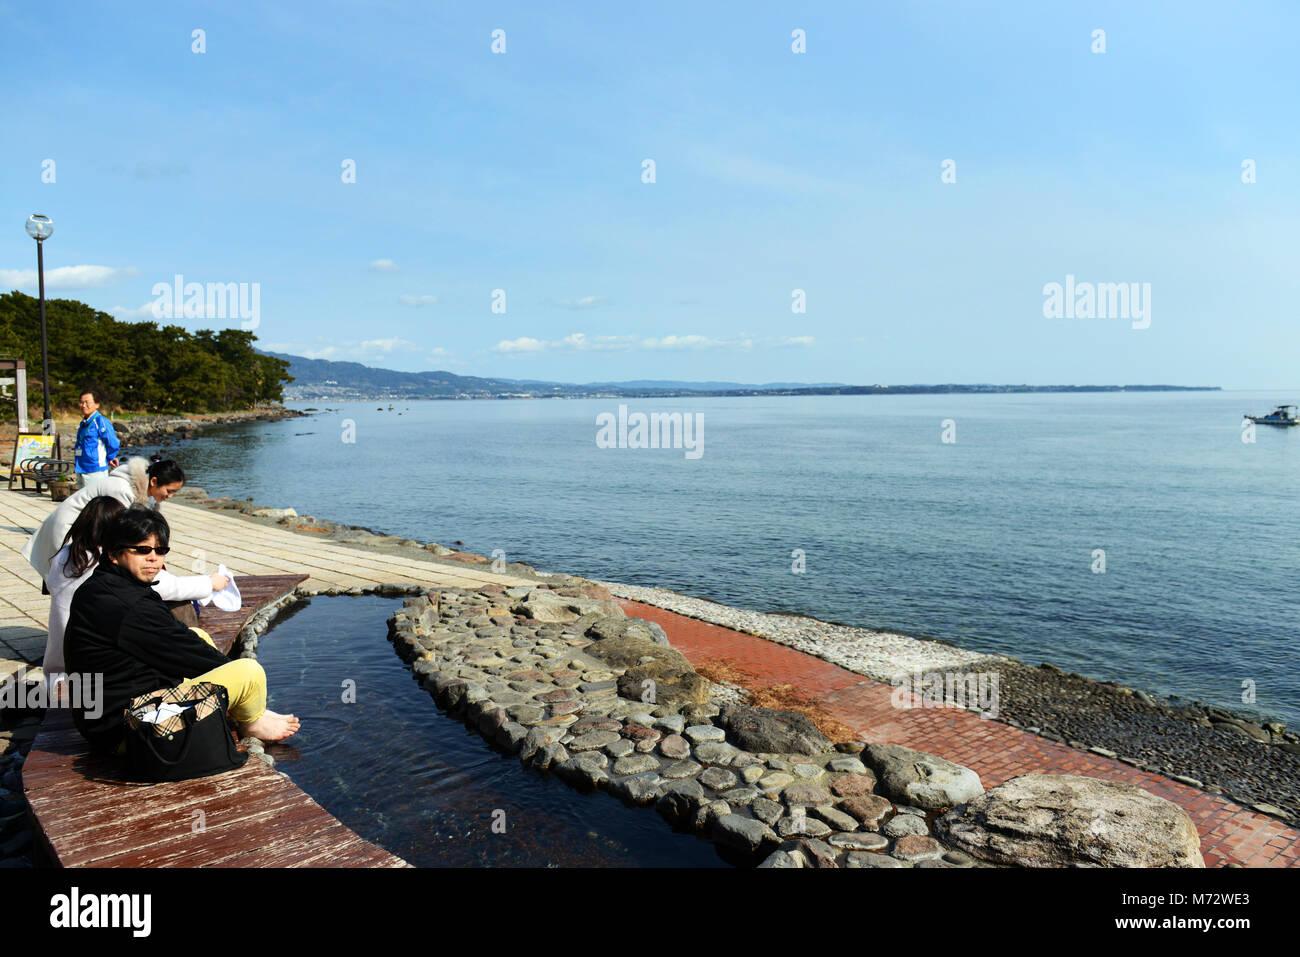 Foot bath by the ocean at Kamegawa onsen by the ocean at Beppu. - Stock Image